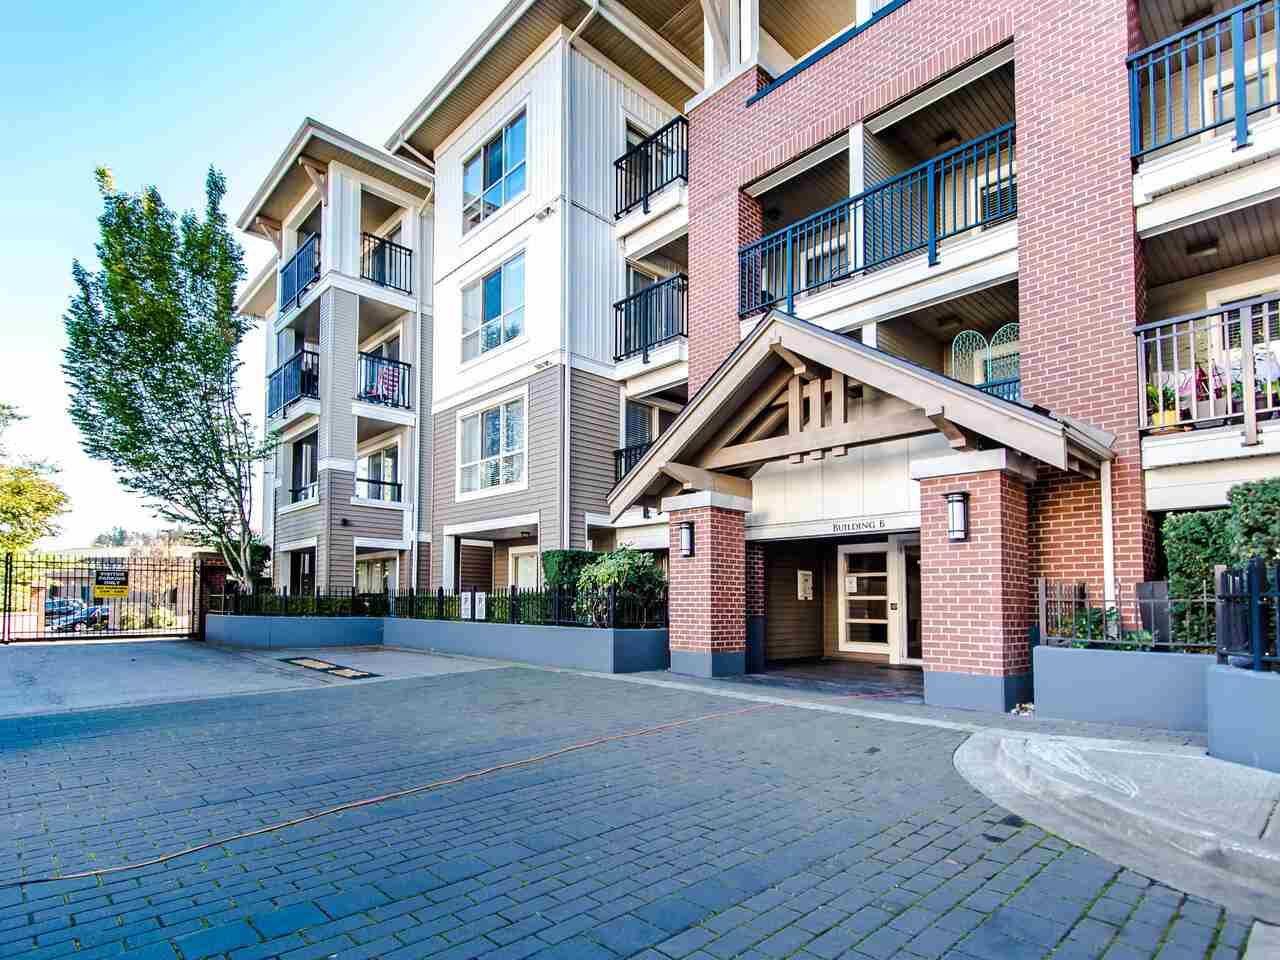 Main Photo: B206 8929 202 Street in Langley: Walnut Grove Condo for sale : MLS®# R2503720